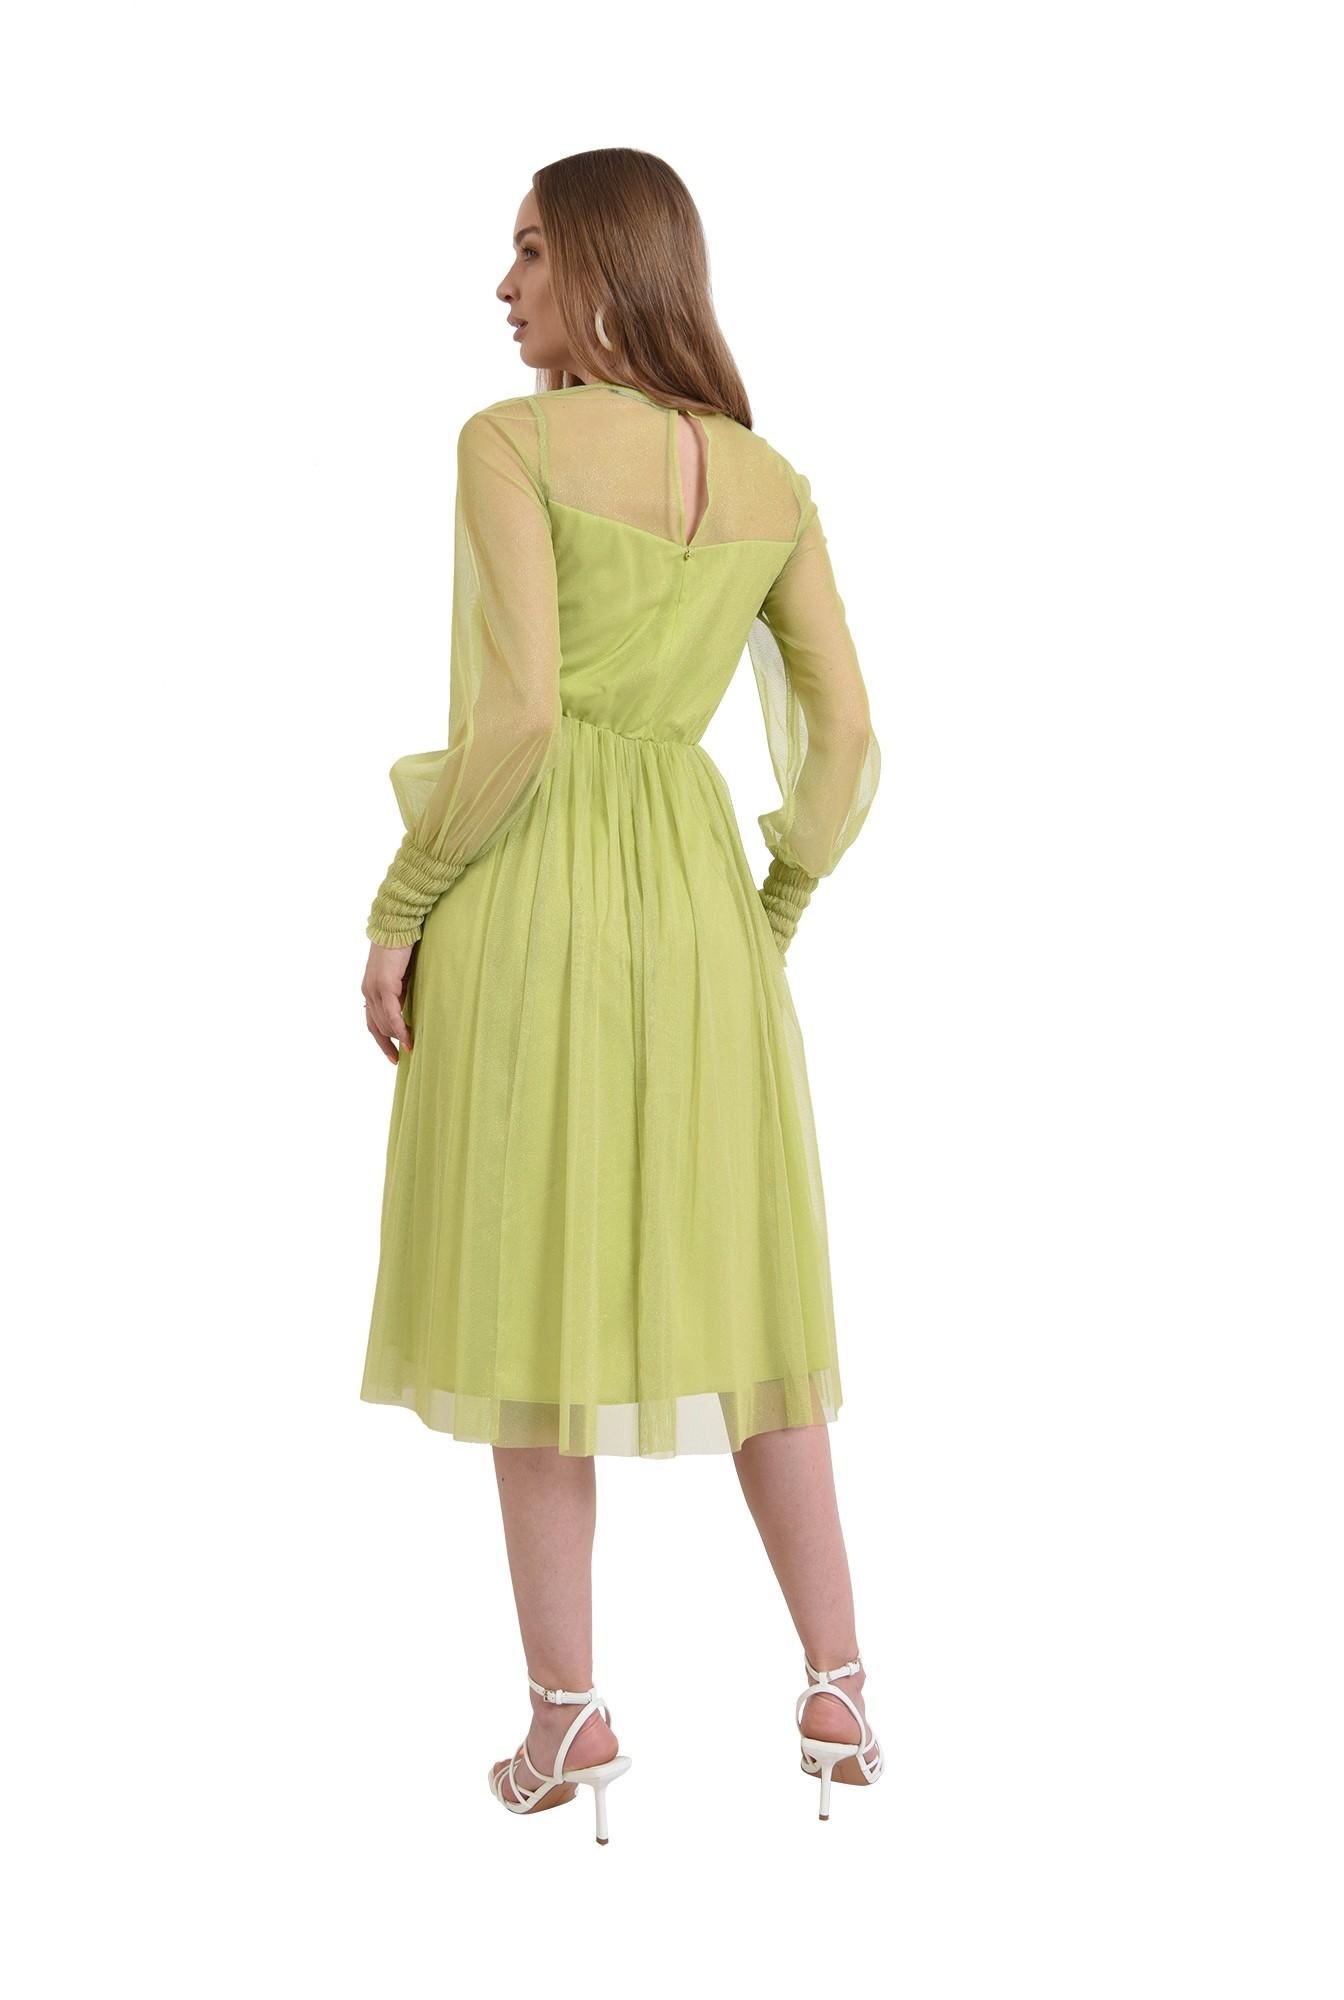 3 - rochie verde, eleganta, stransa la talie